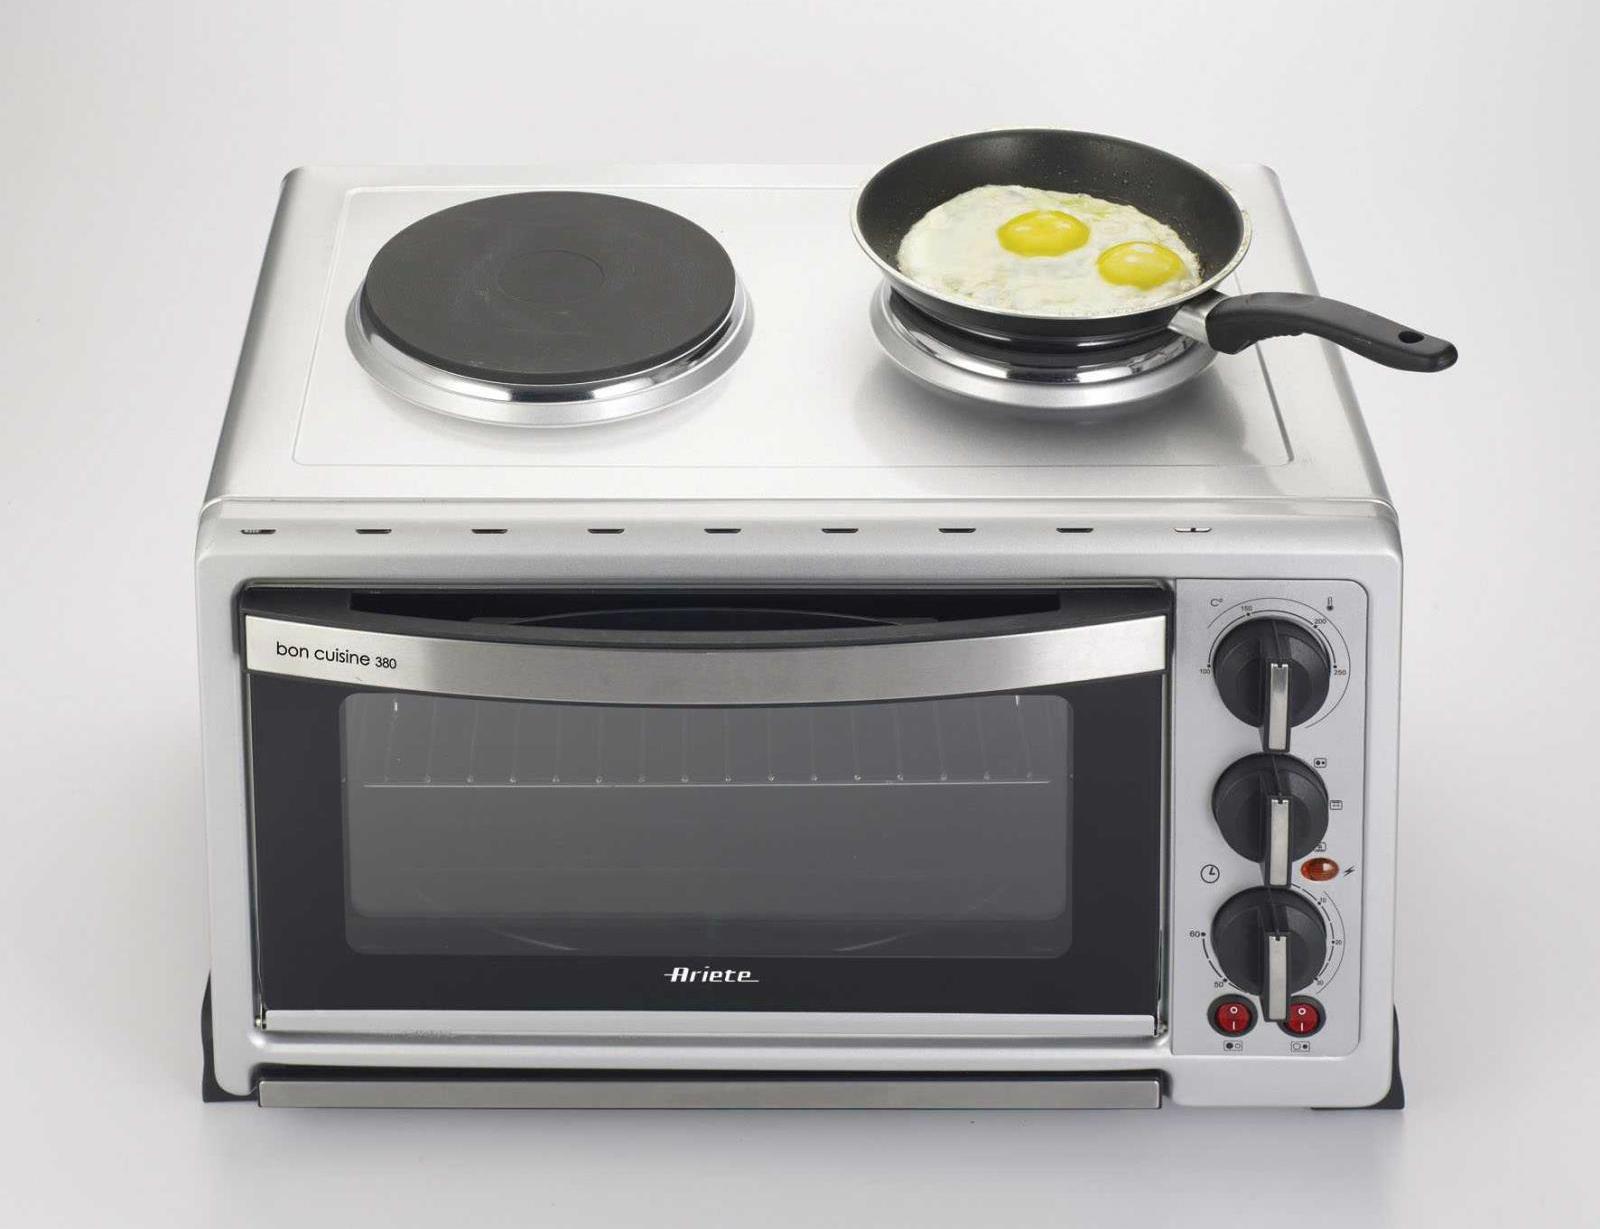 Ariete 977 bon cuisine 380 minis t 2 f z lappal for Ariete bon cuisine 250 metal